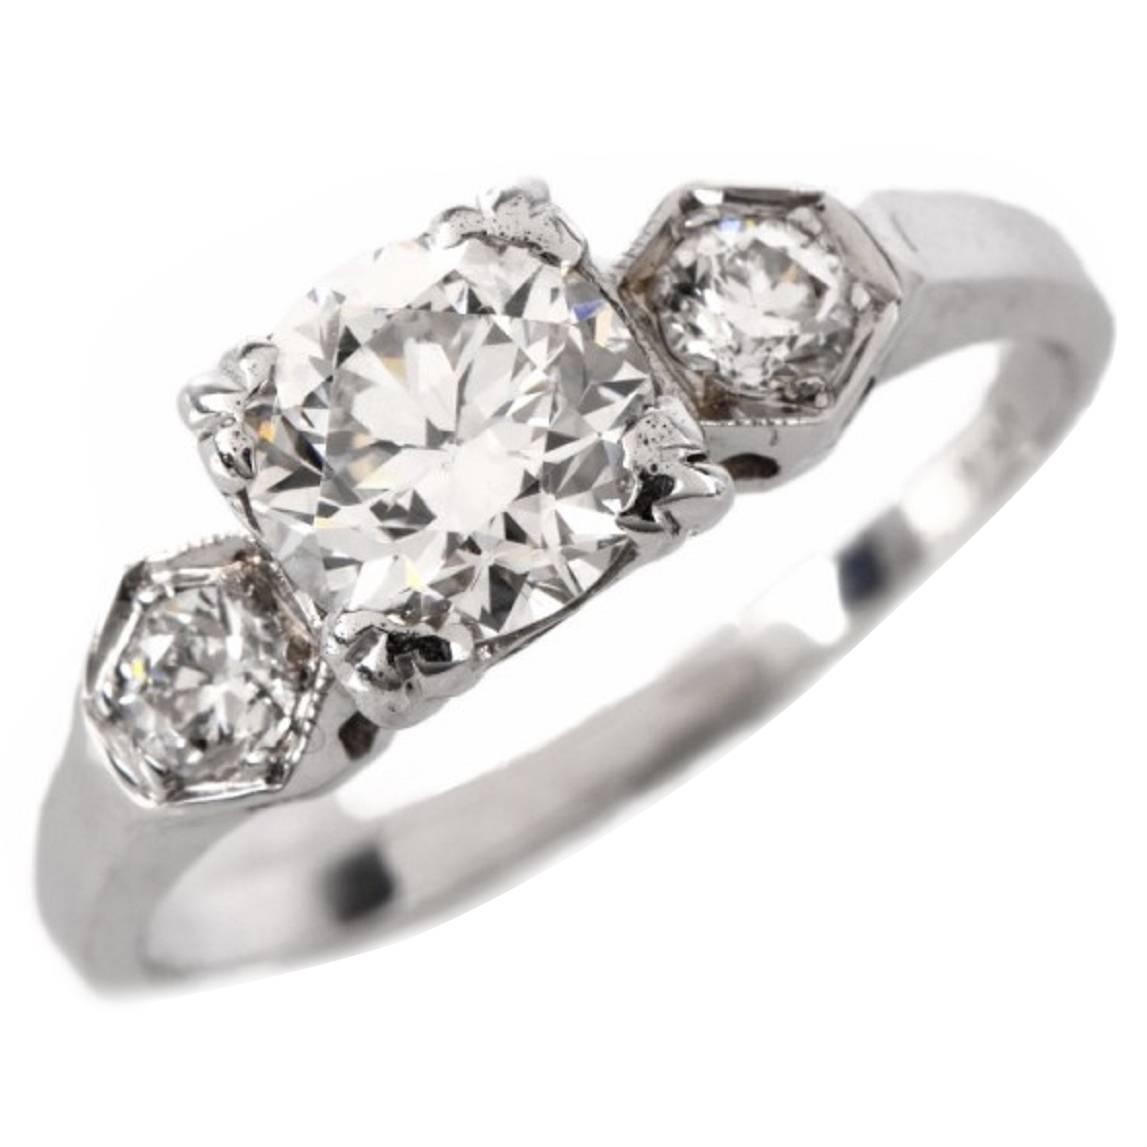 115 Carat European Cut Diamond Gold Engagement Ring At. Naira Engagement Rings. Levain Rings. Promise Rings Wedding Rings. Minimalist Wedding Rings. Antique Sterling Silver Wedding Rings. Cushion Cut Wedding Rings. Lexie Wedding Rings. Word Engagement Rings